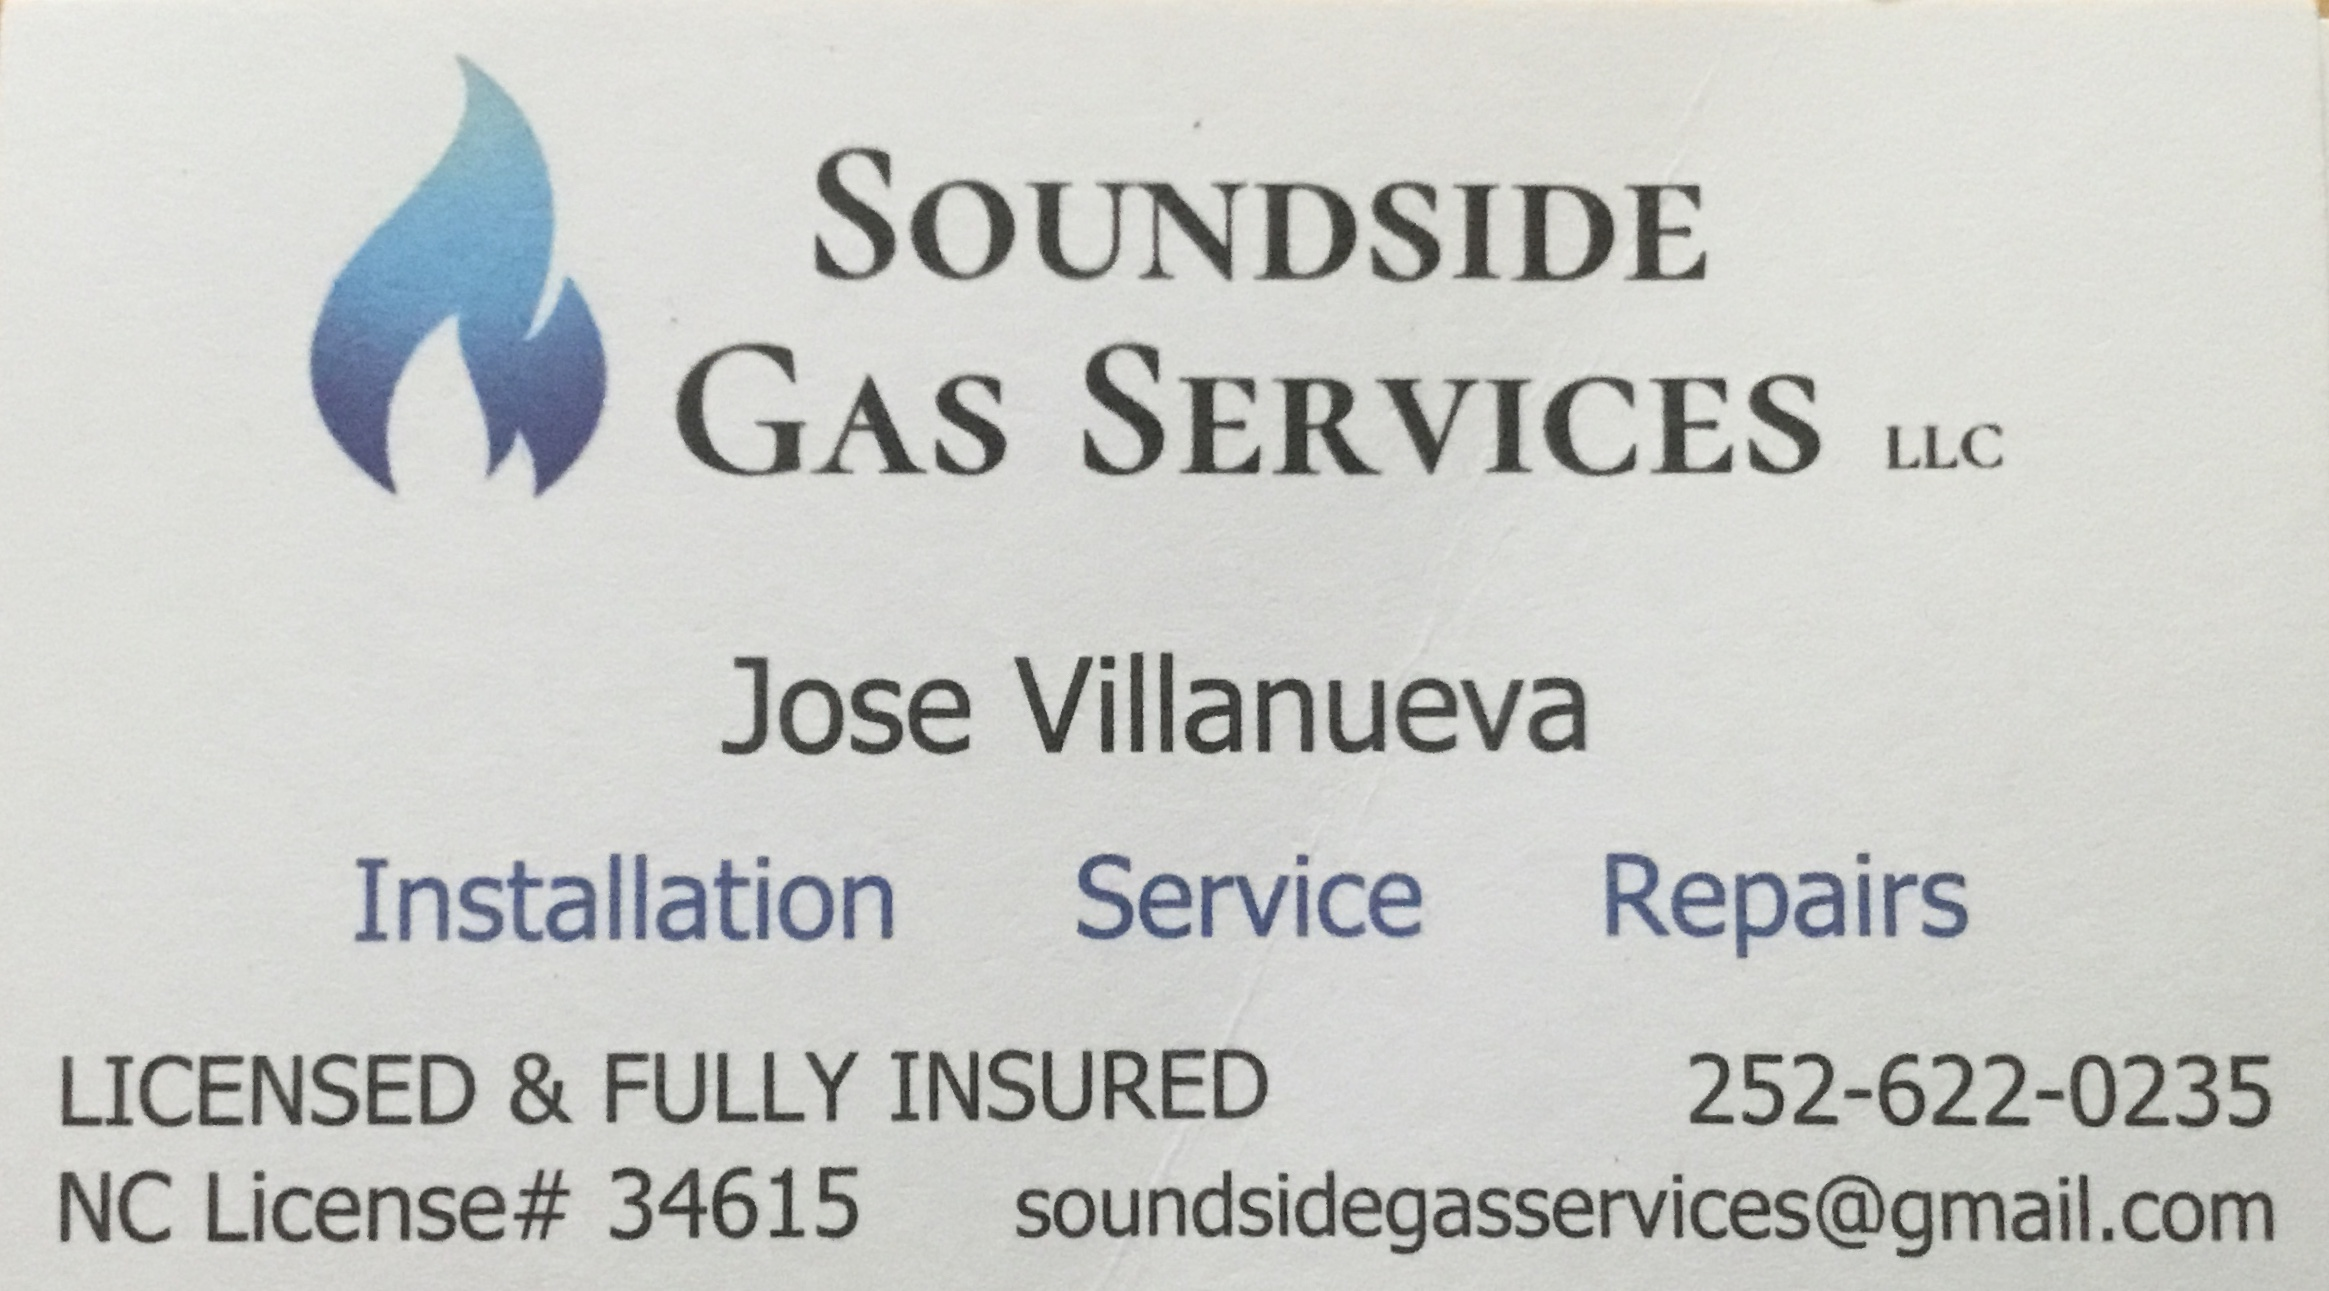 Soundside Gas Services LLC